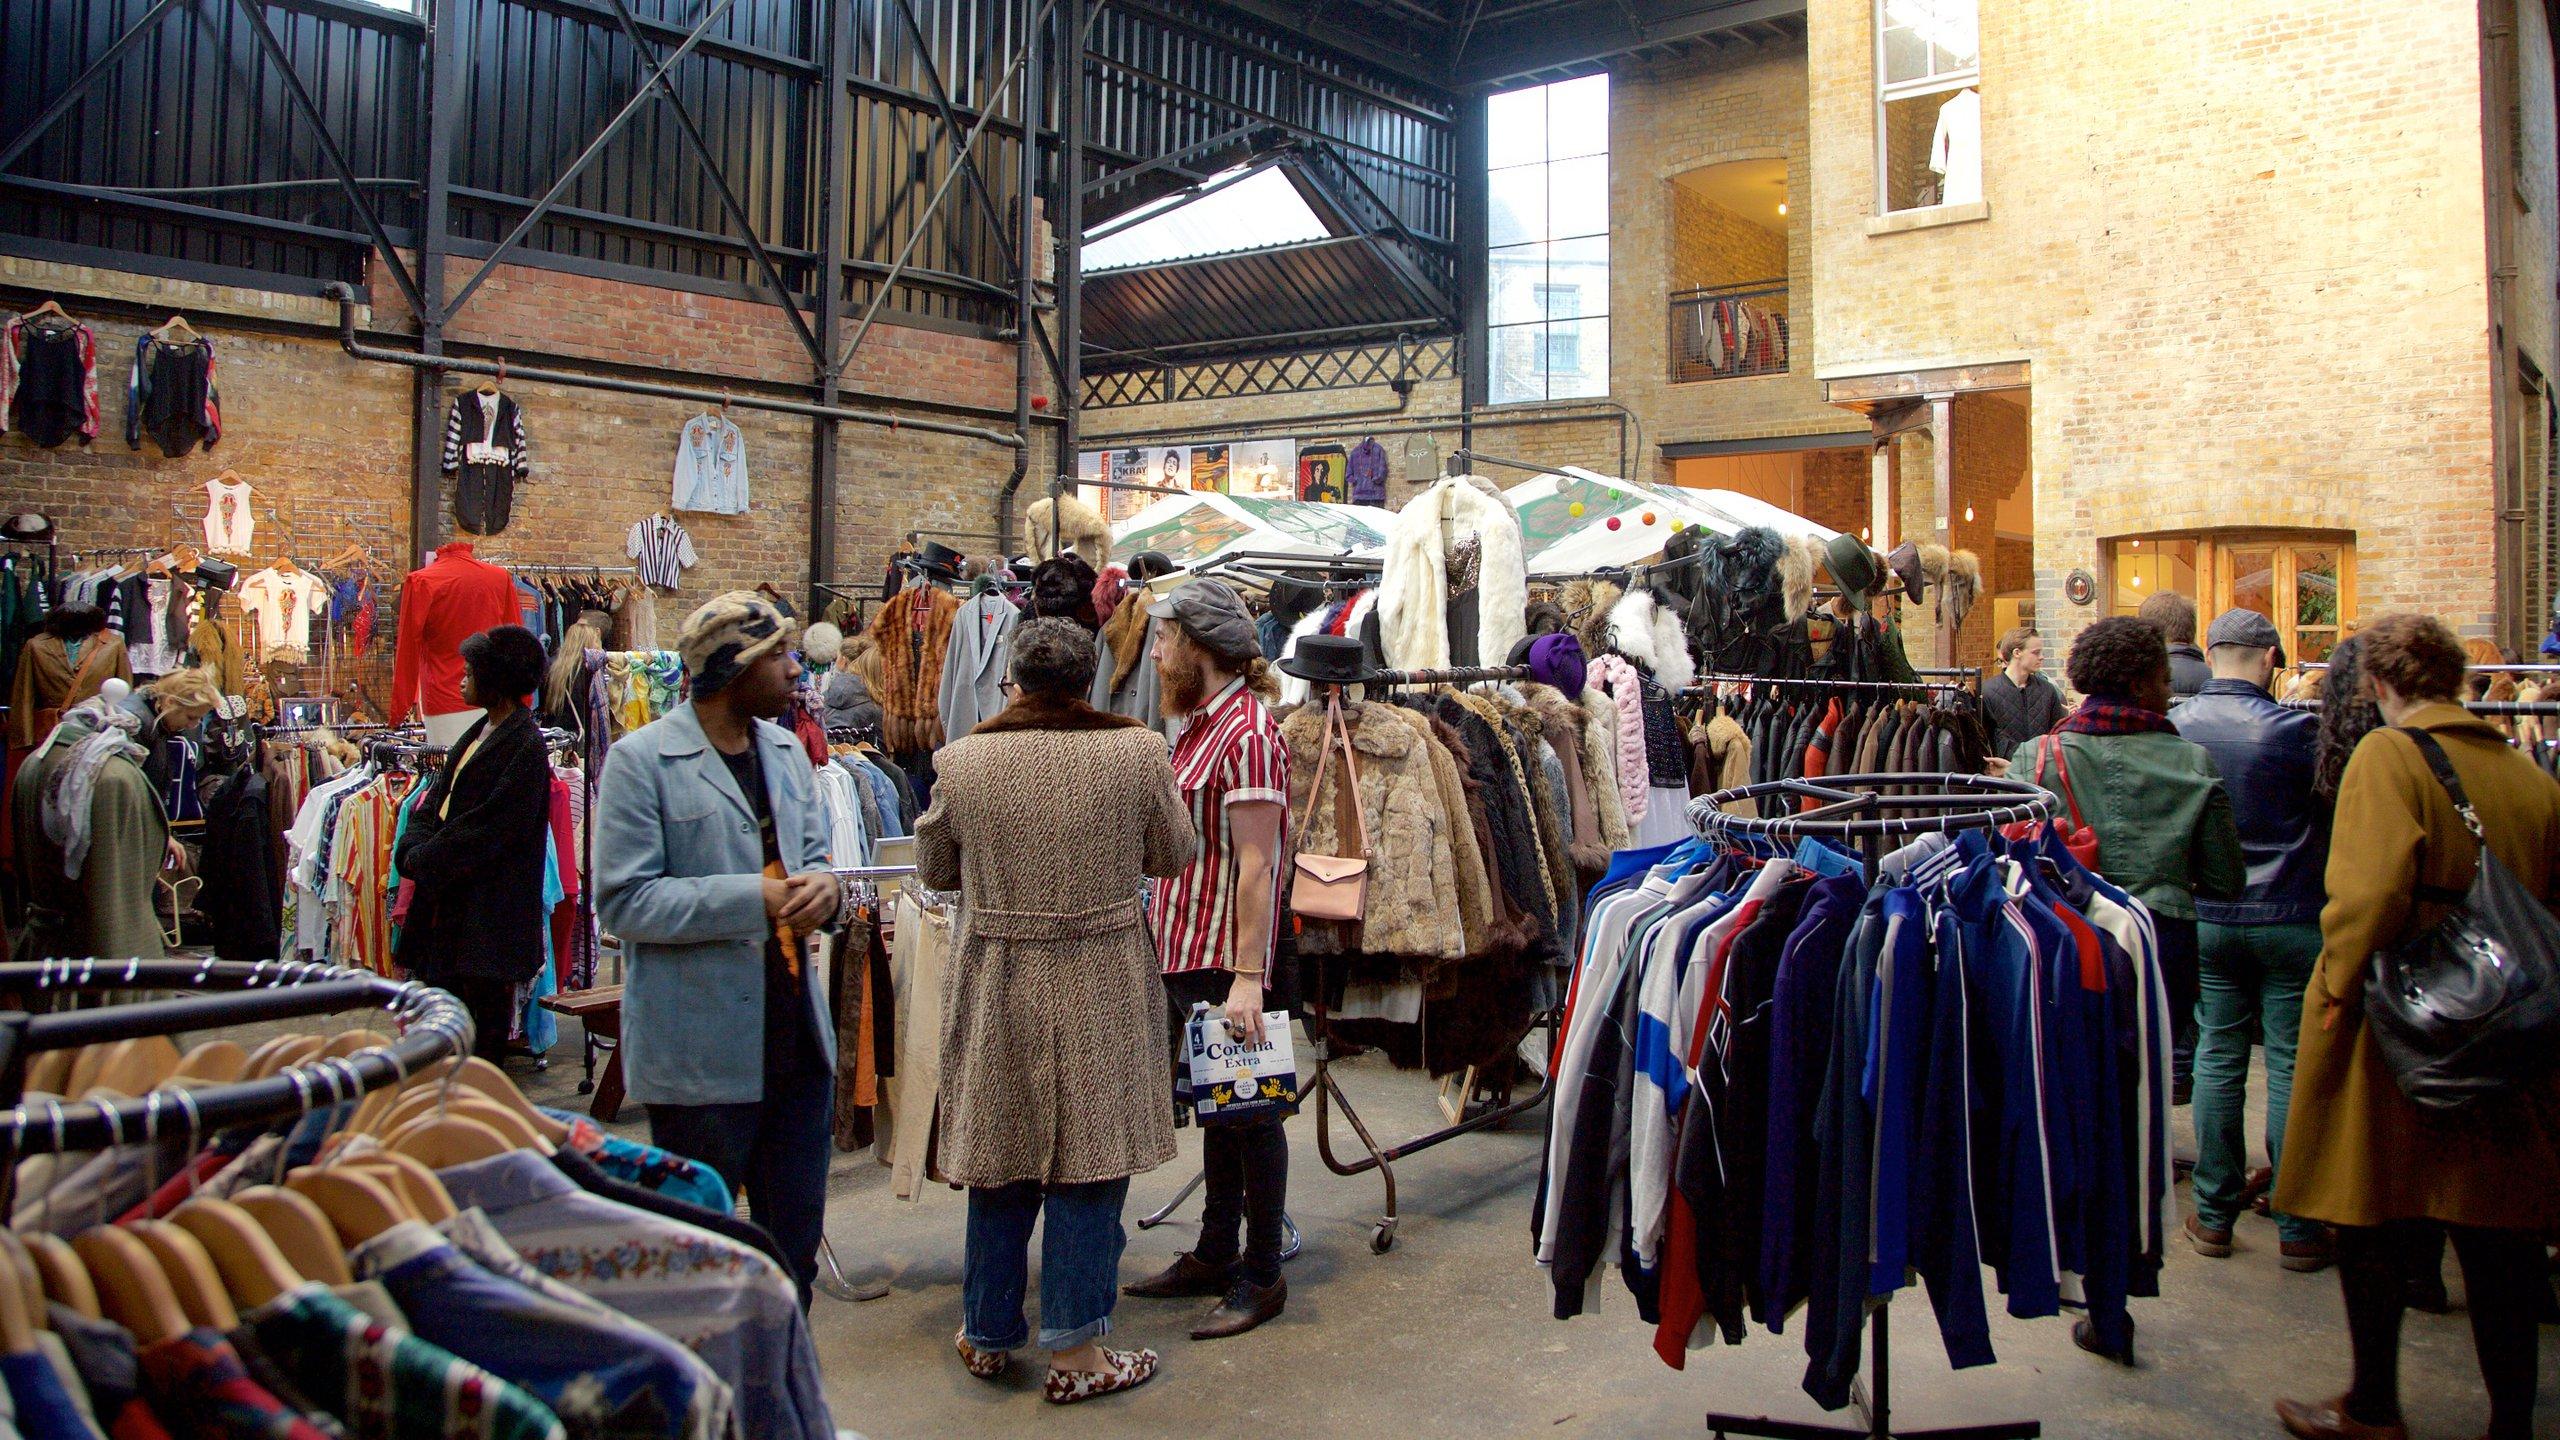 Old Spitalfields Market, London, England, United Kingdom